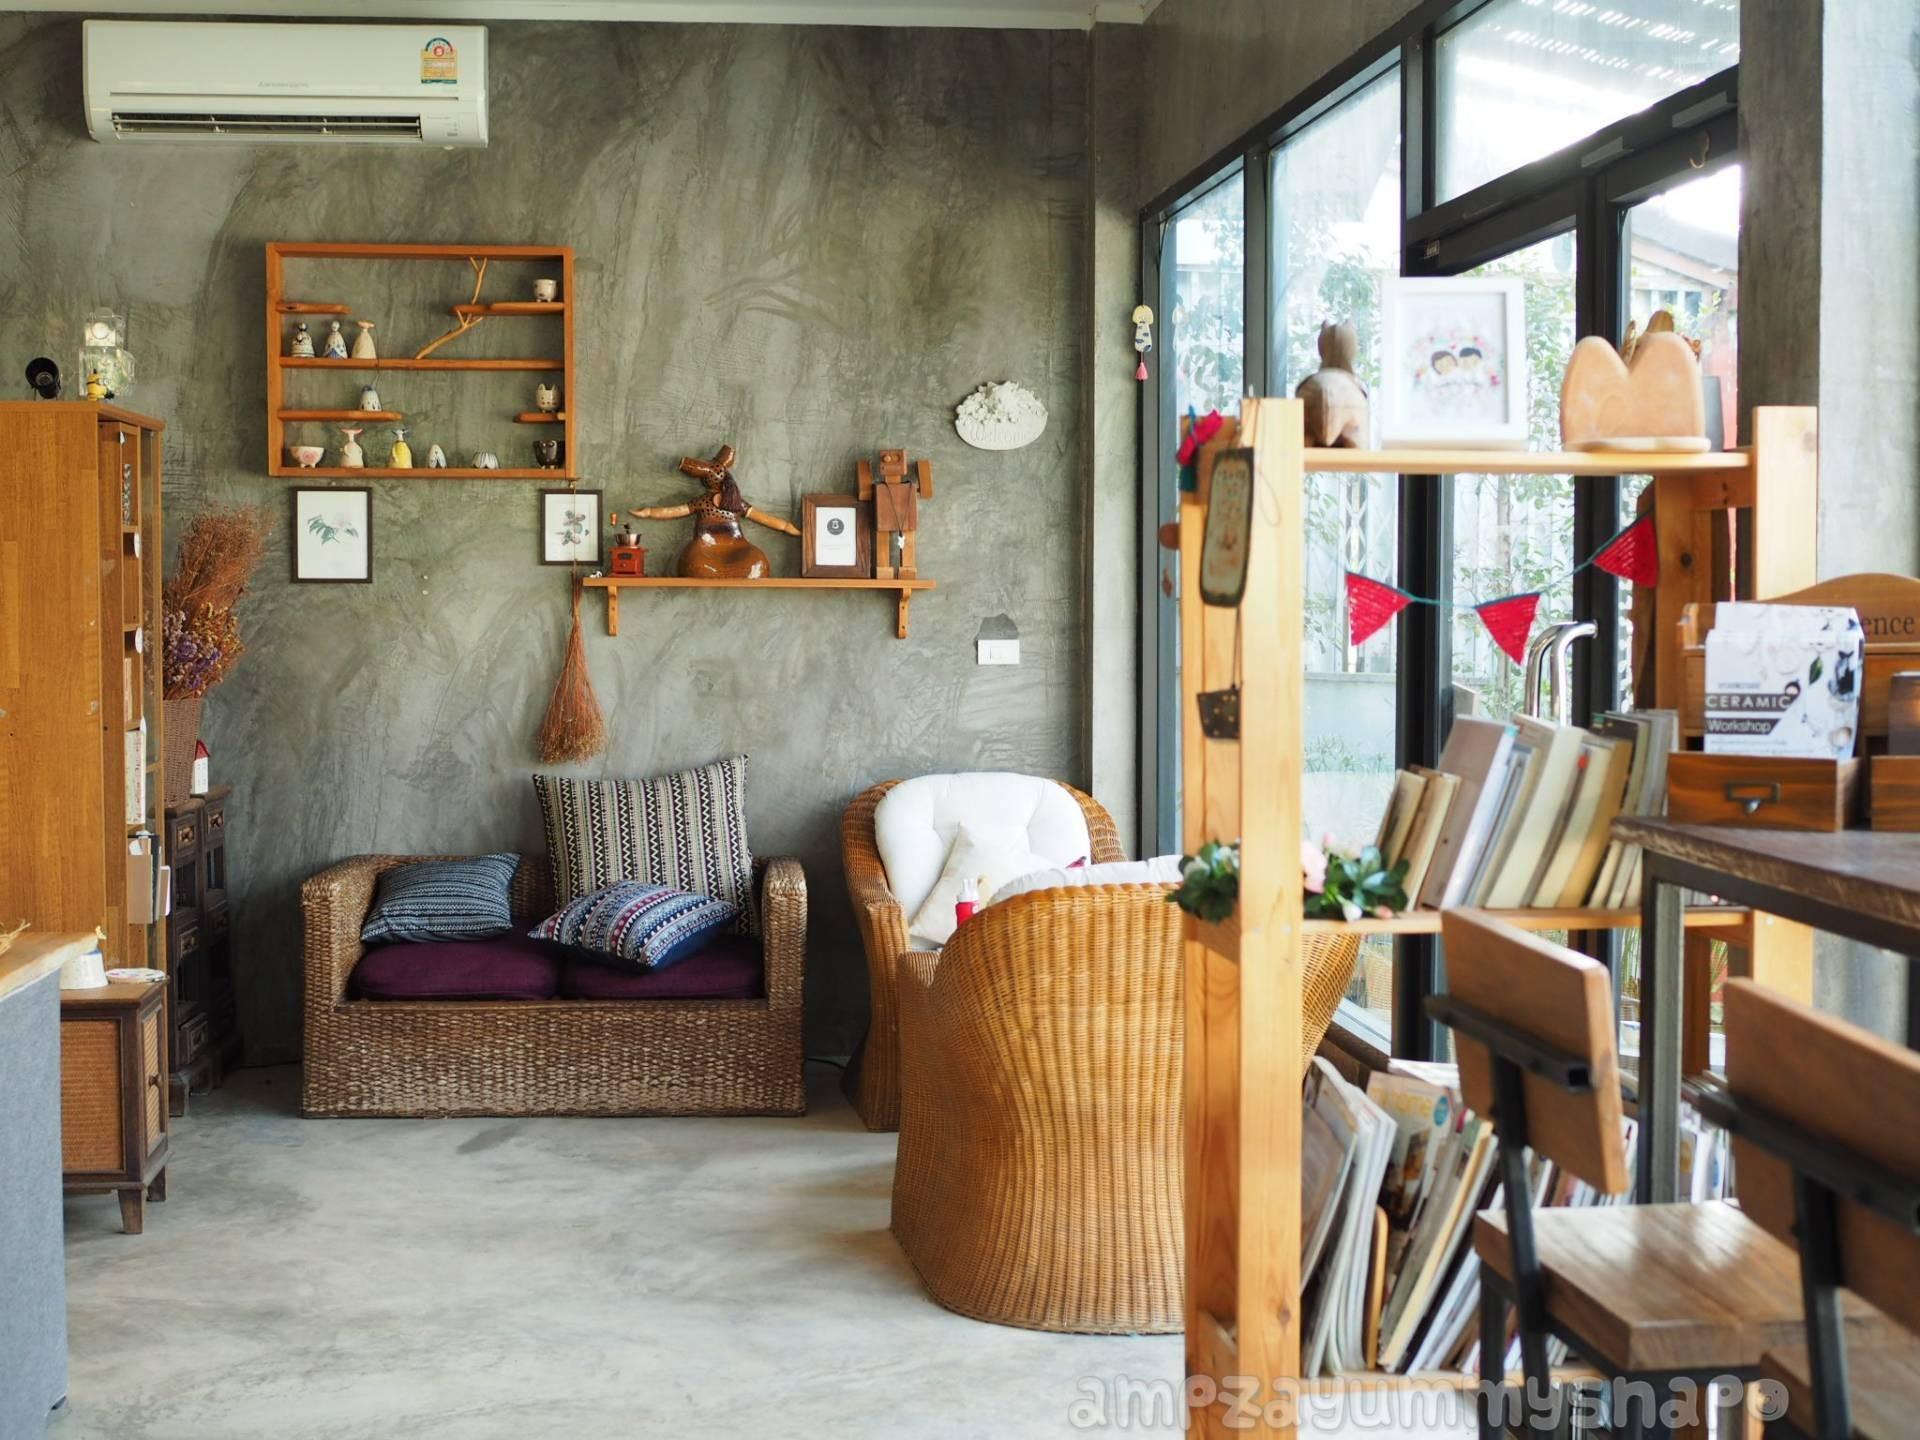 Joon studio & cafe' นครปฐม